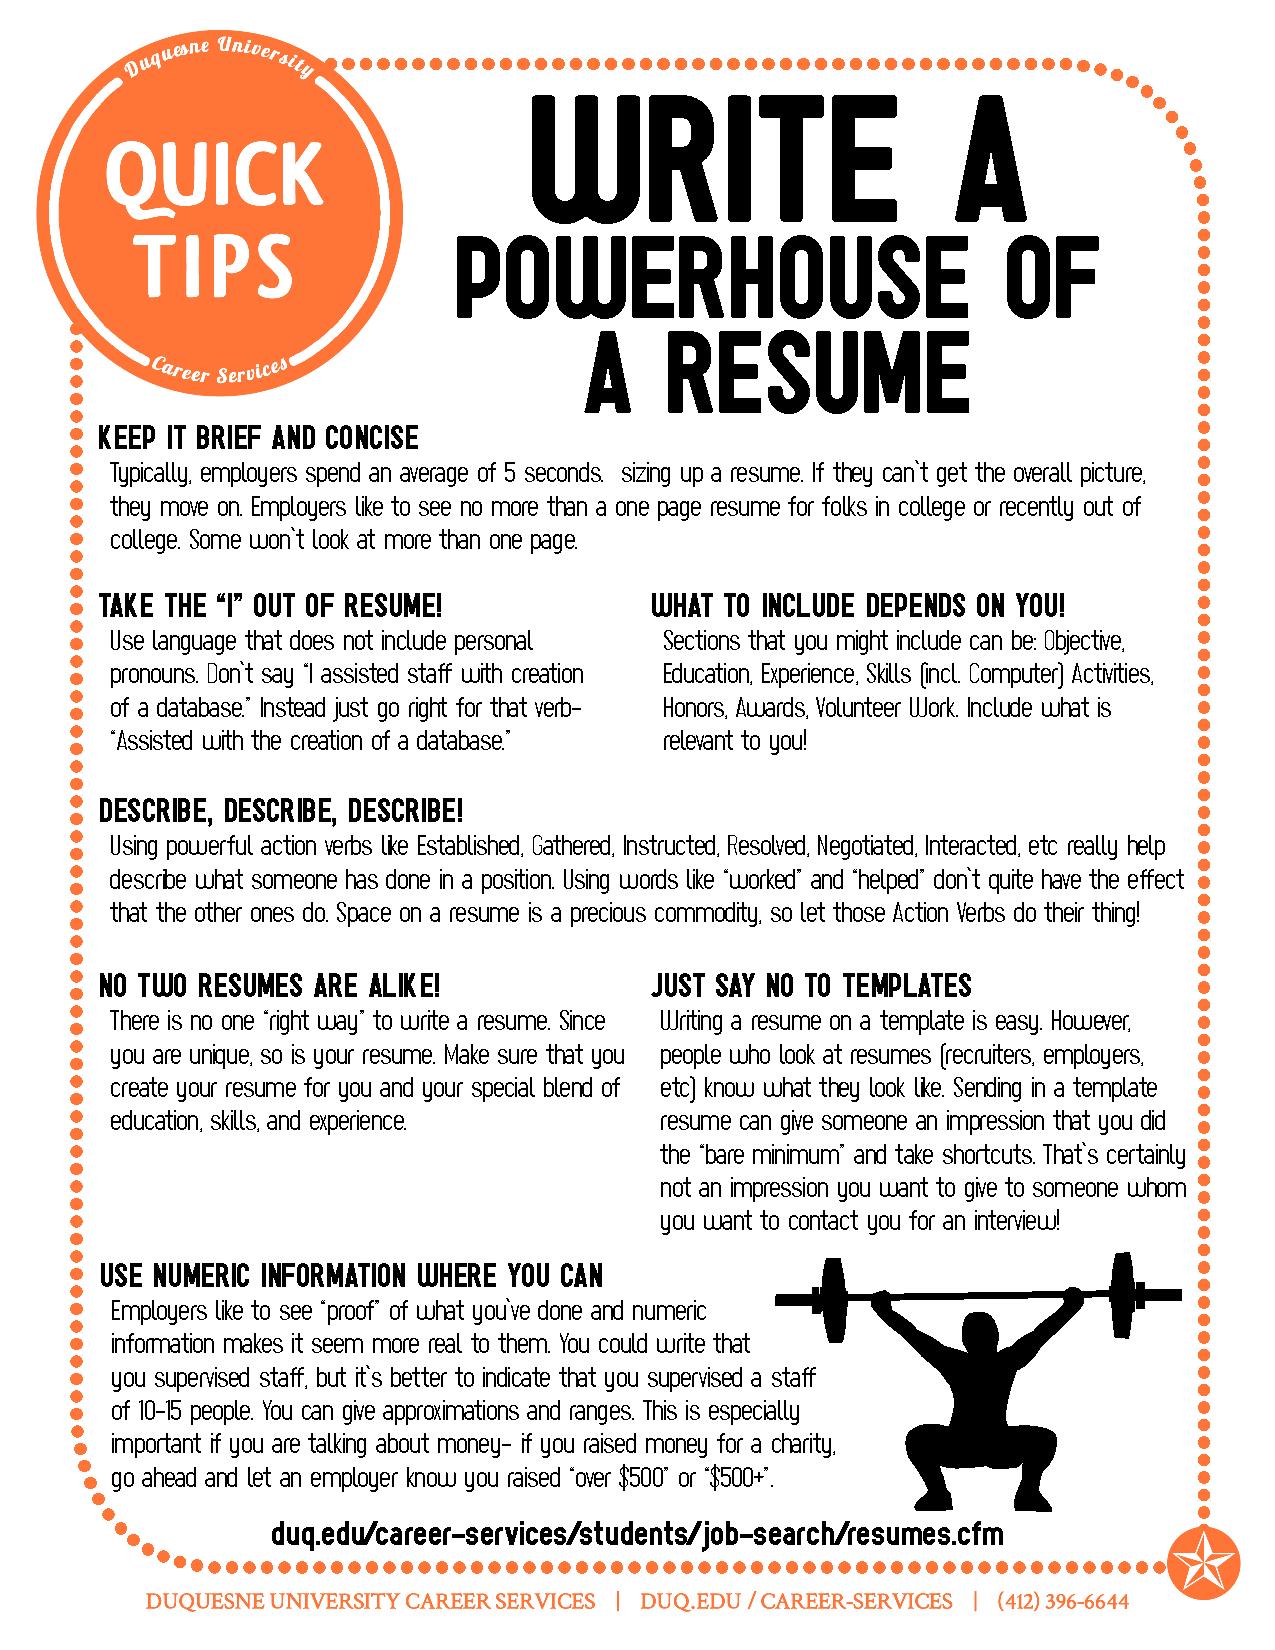 resume writing tips - Military.bralicious.co